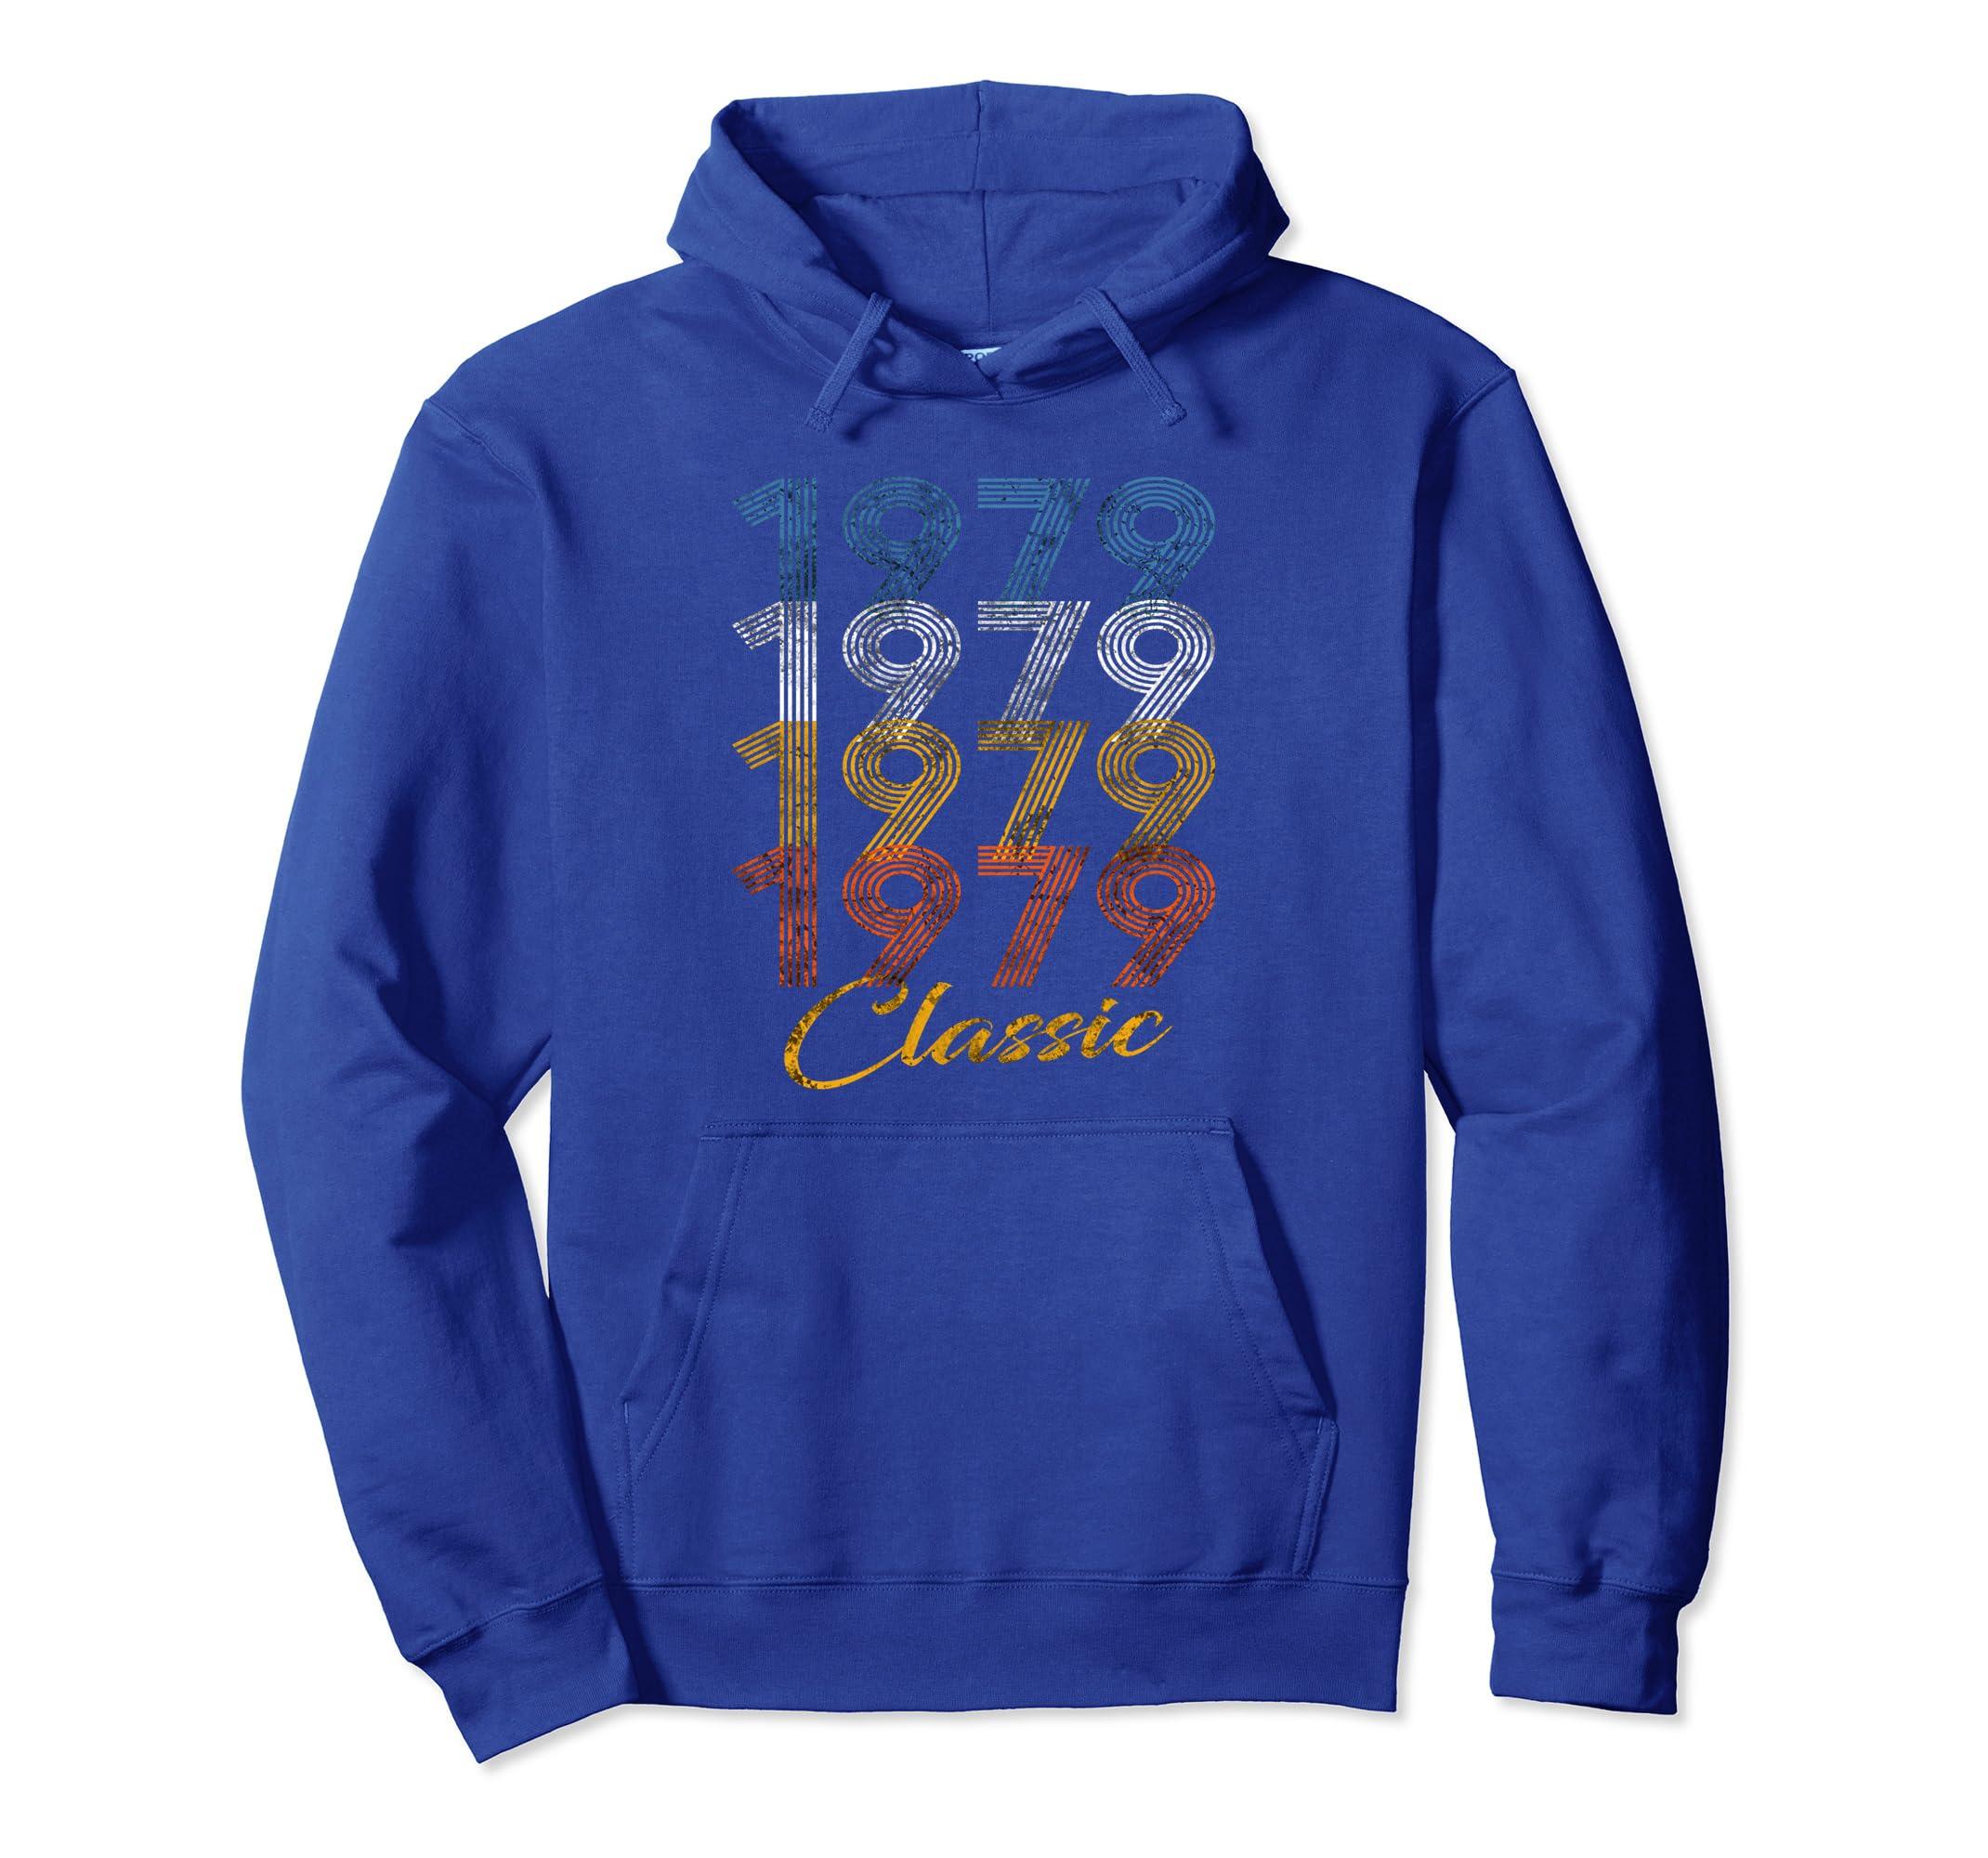 1979 Classic Vintage 40 Years 40th Birthday 70s Gift Hoodie-ln